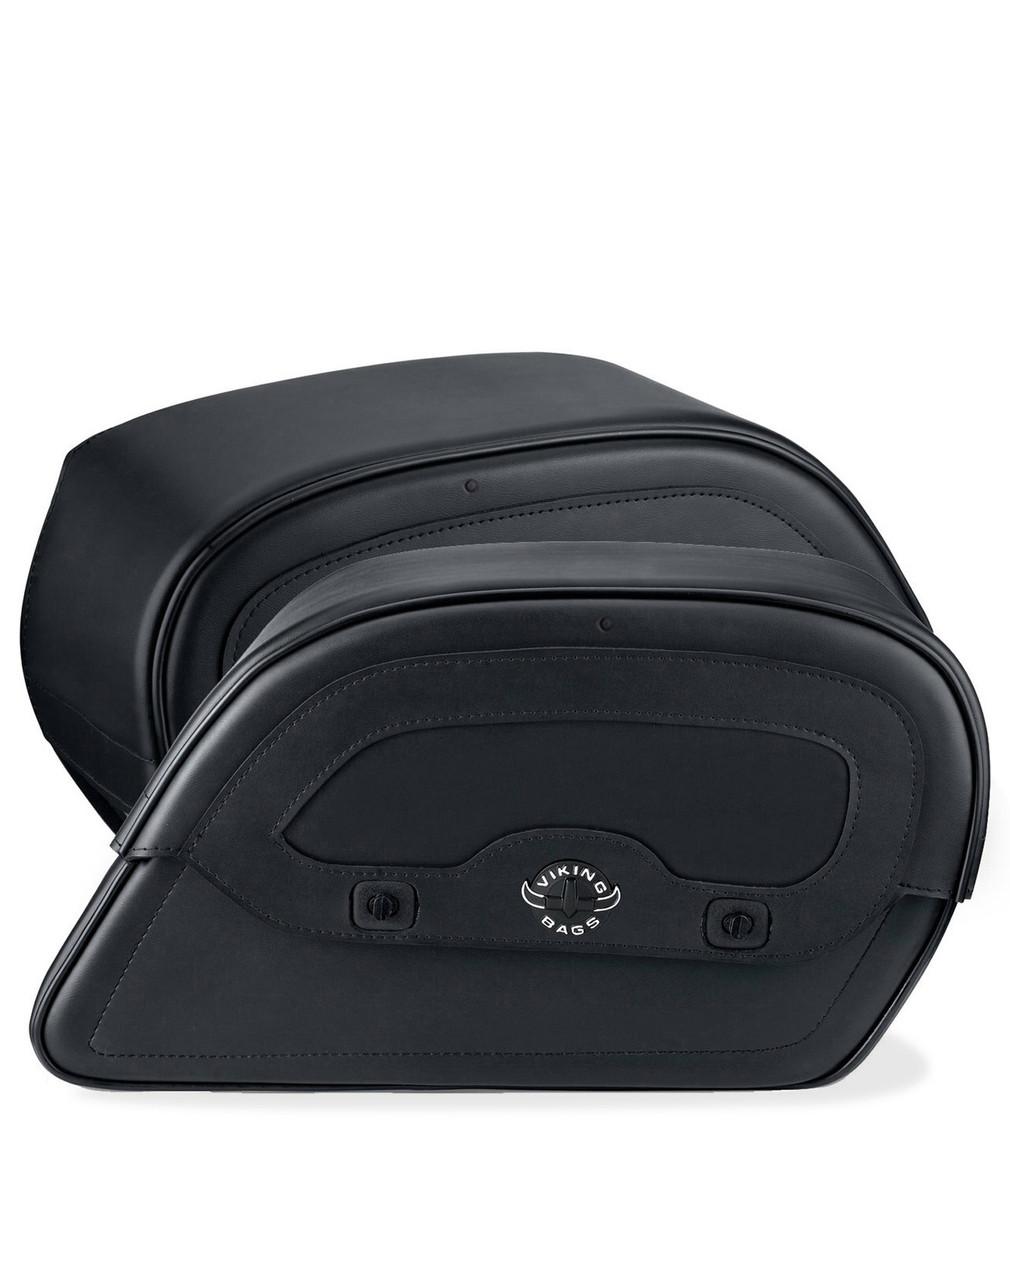 Honda VTX 1300 C Medium Warrior Slanted Motorcycle Saddlebags Both Bags View